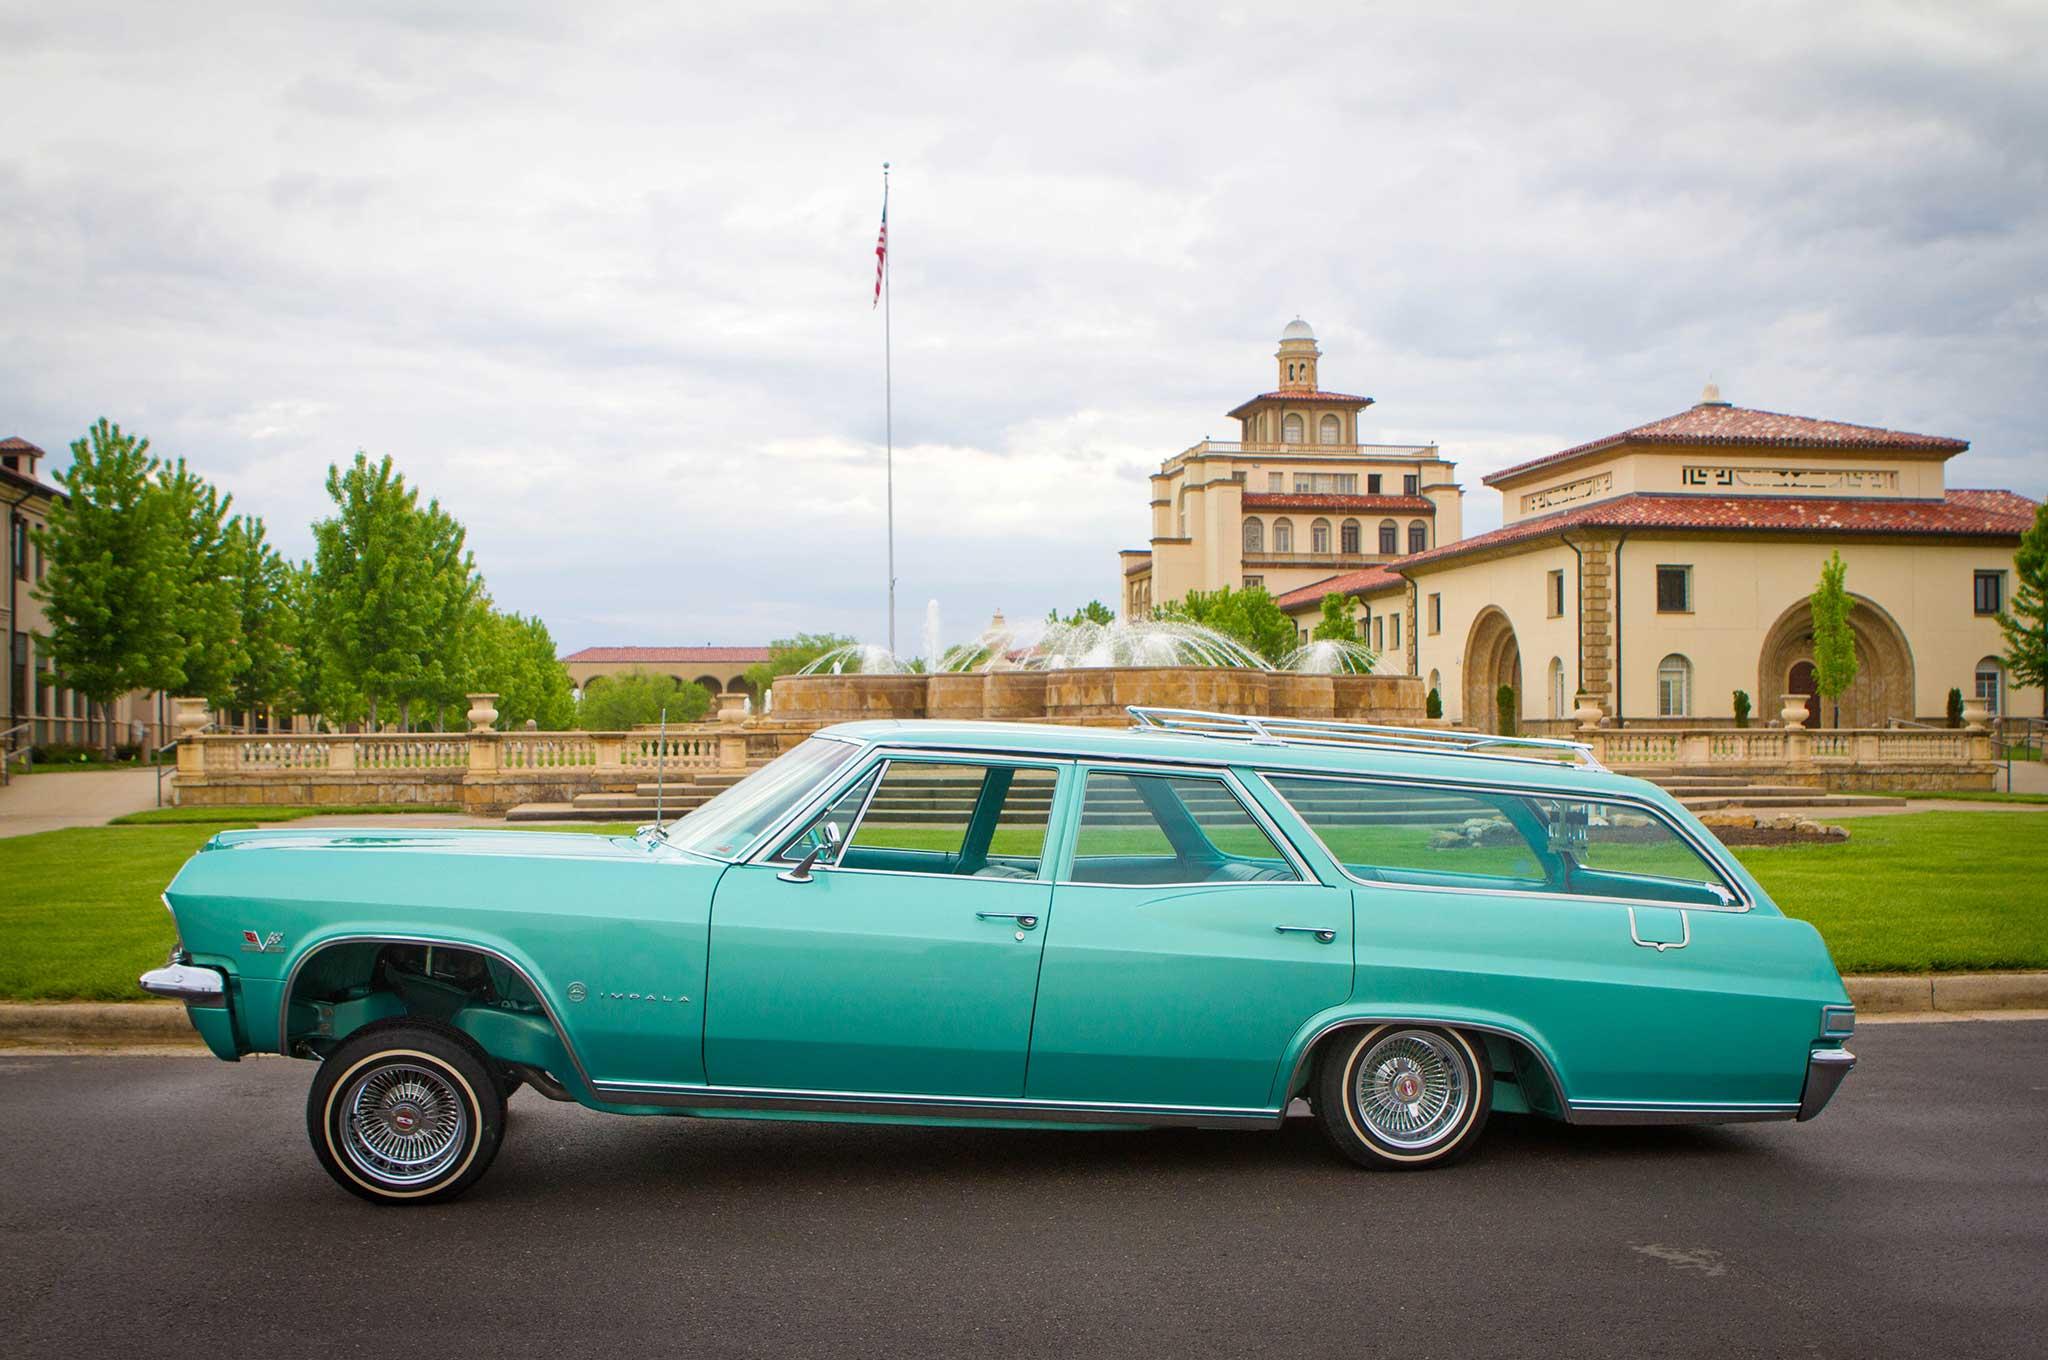 1965 Chevrolet Impala Wagon - Outside The Box